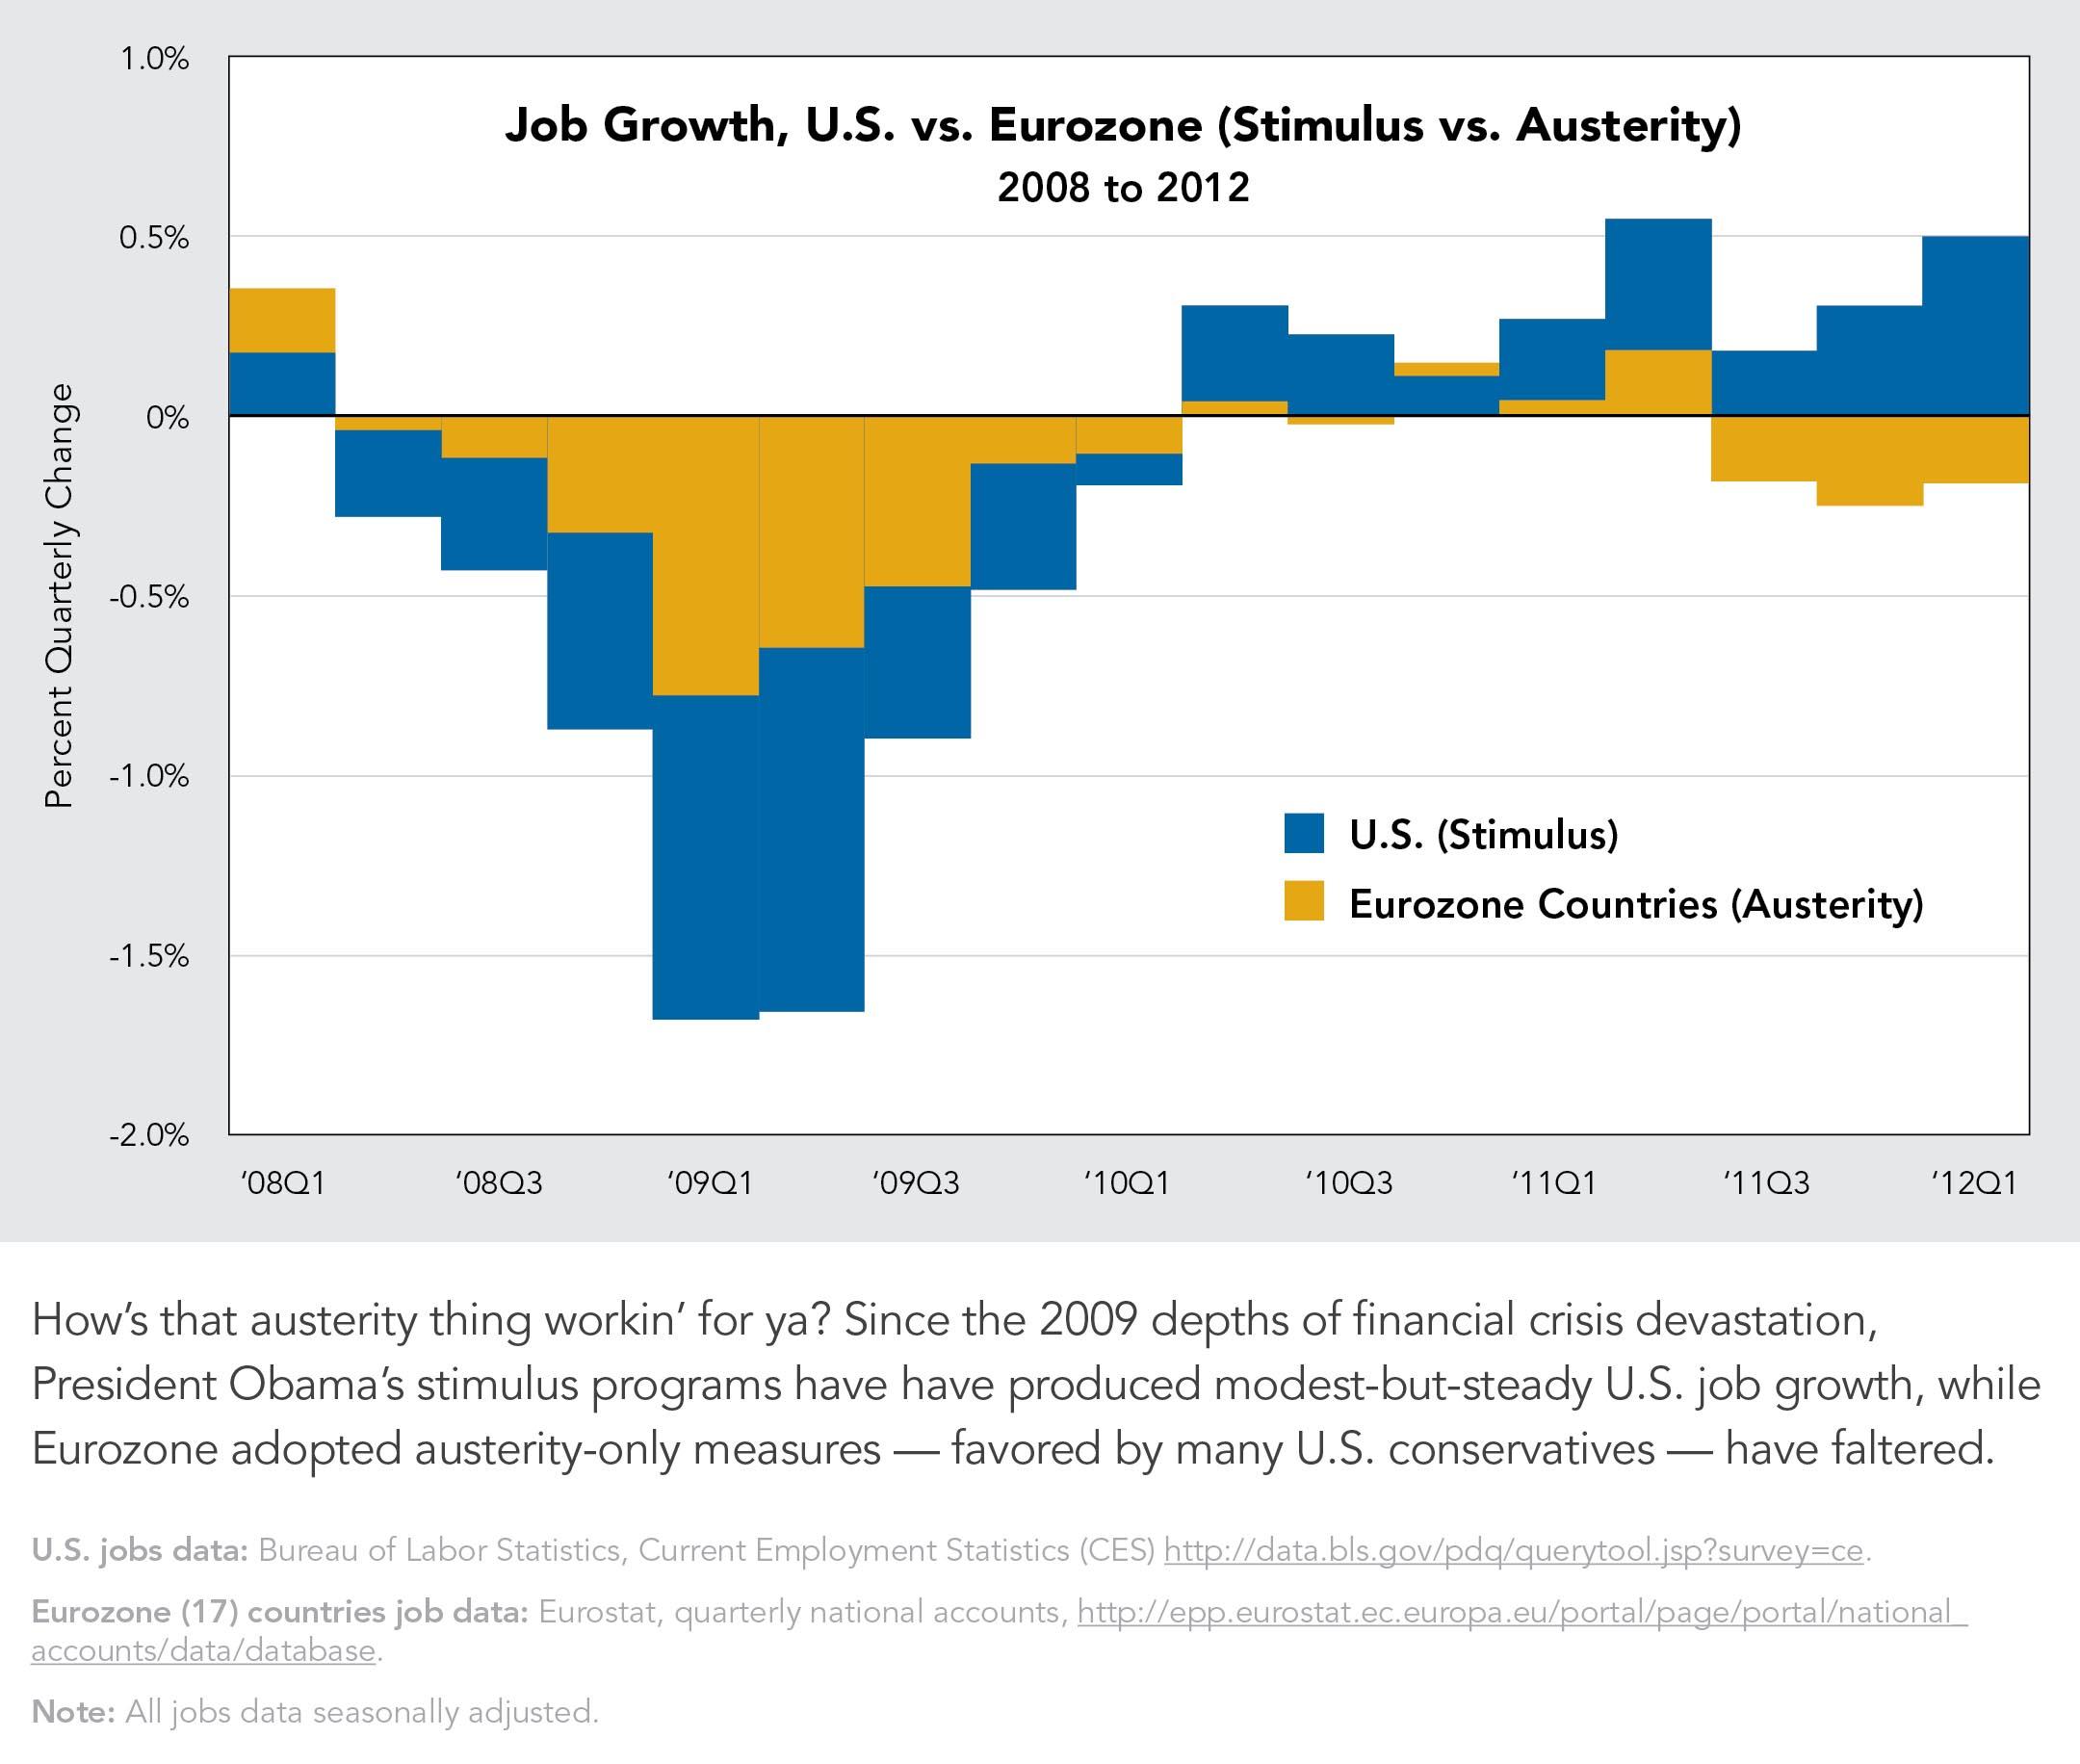 Job Growth U.S. vs. Eurozone (Stimulus vs. Austerity)